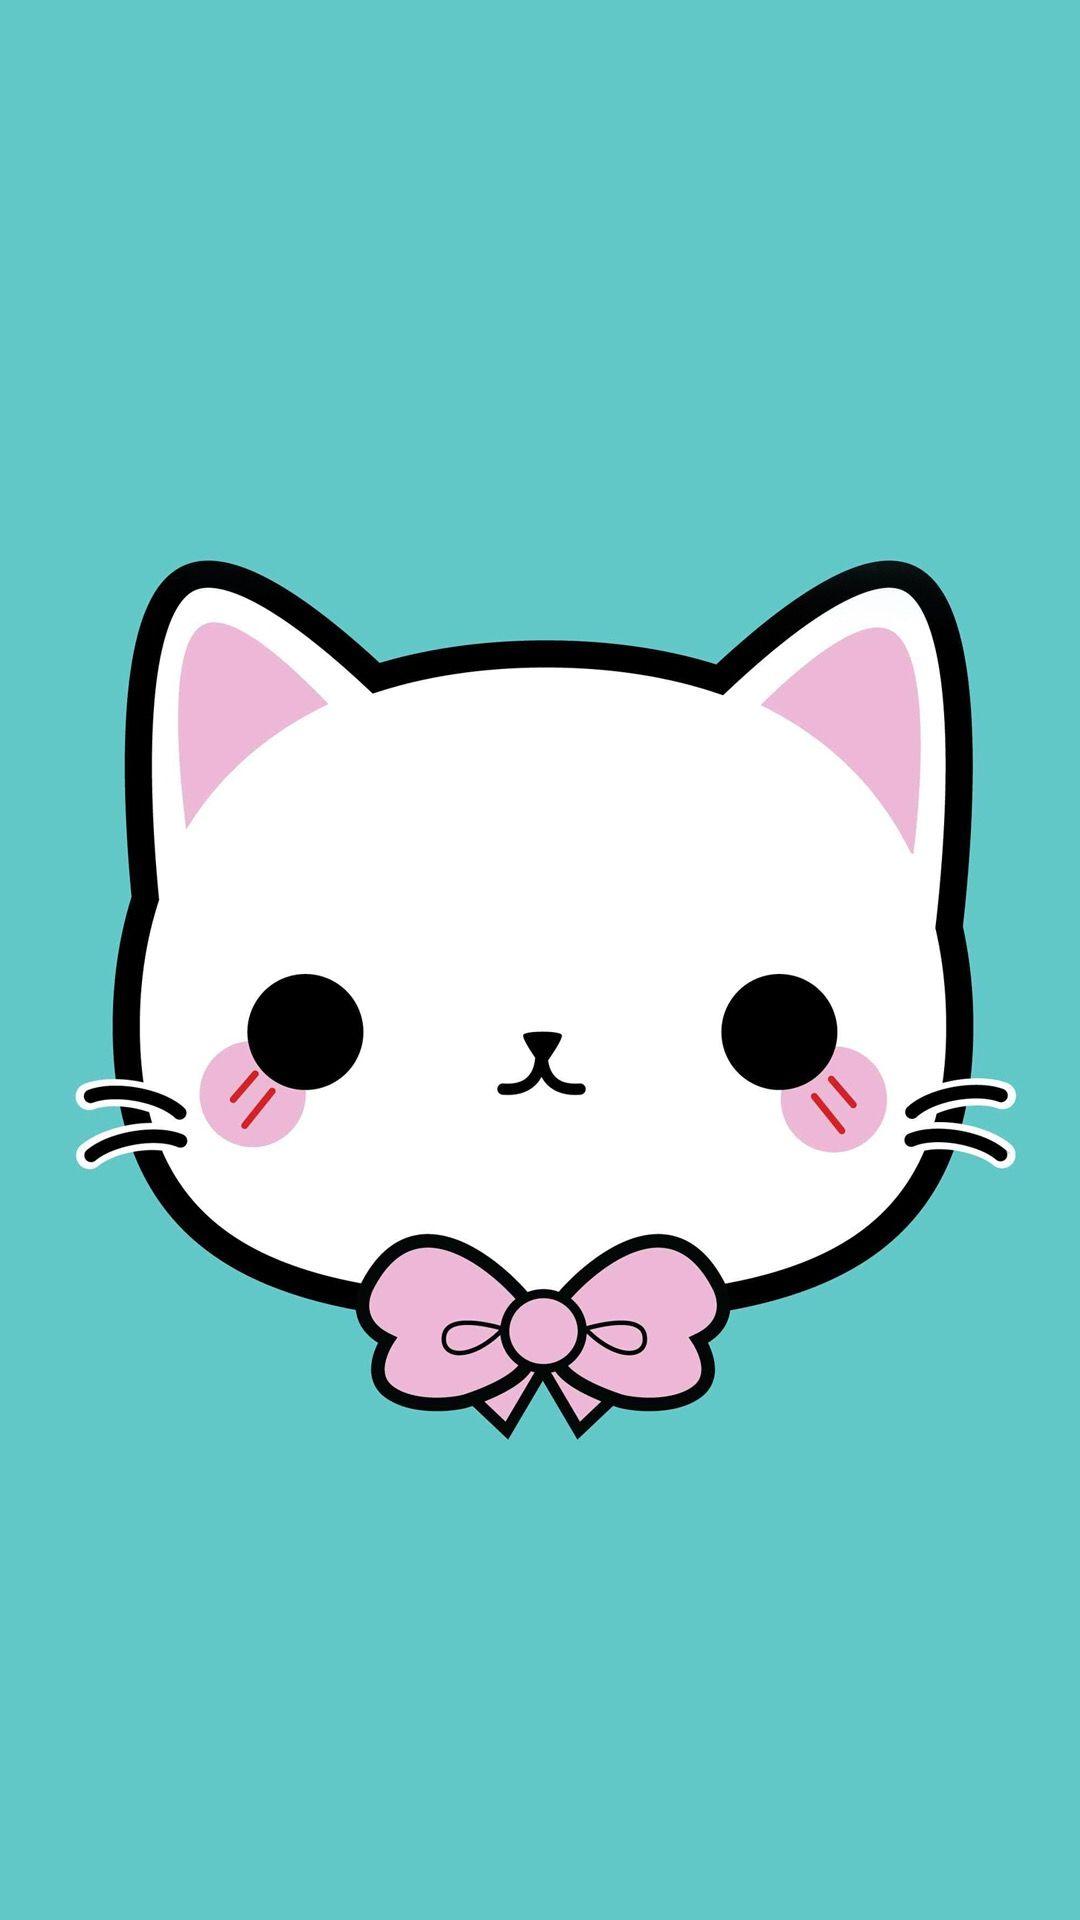 Hd wallpaper kawaii - Cutieh